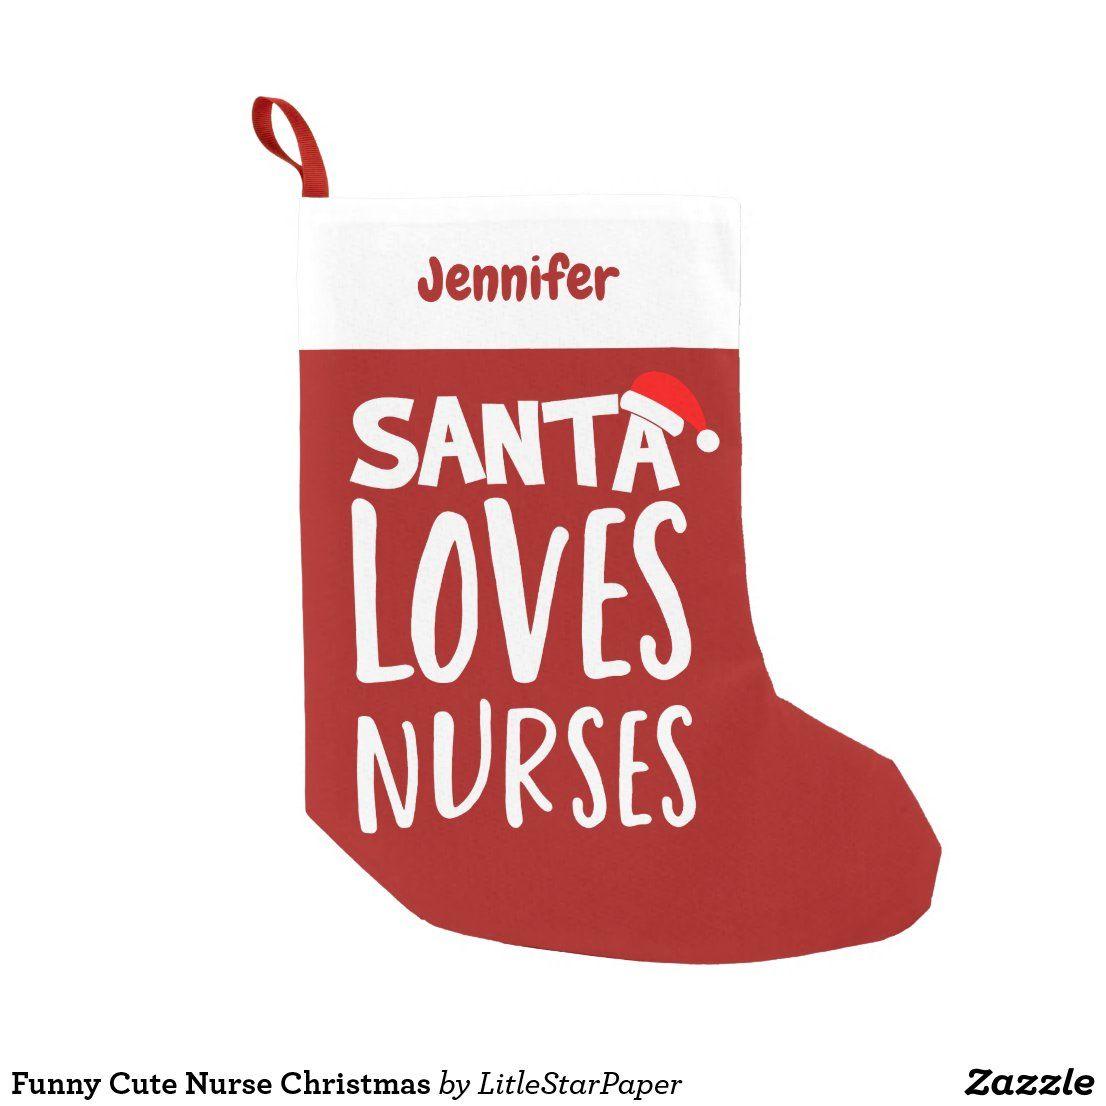 Funny Cute Nurse Christmas Small Christmas Stocking Zazzle Com In 2020 Nurse Christmas Christmas Stockings Christmas Stockings Personalized